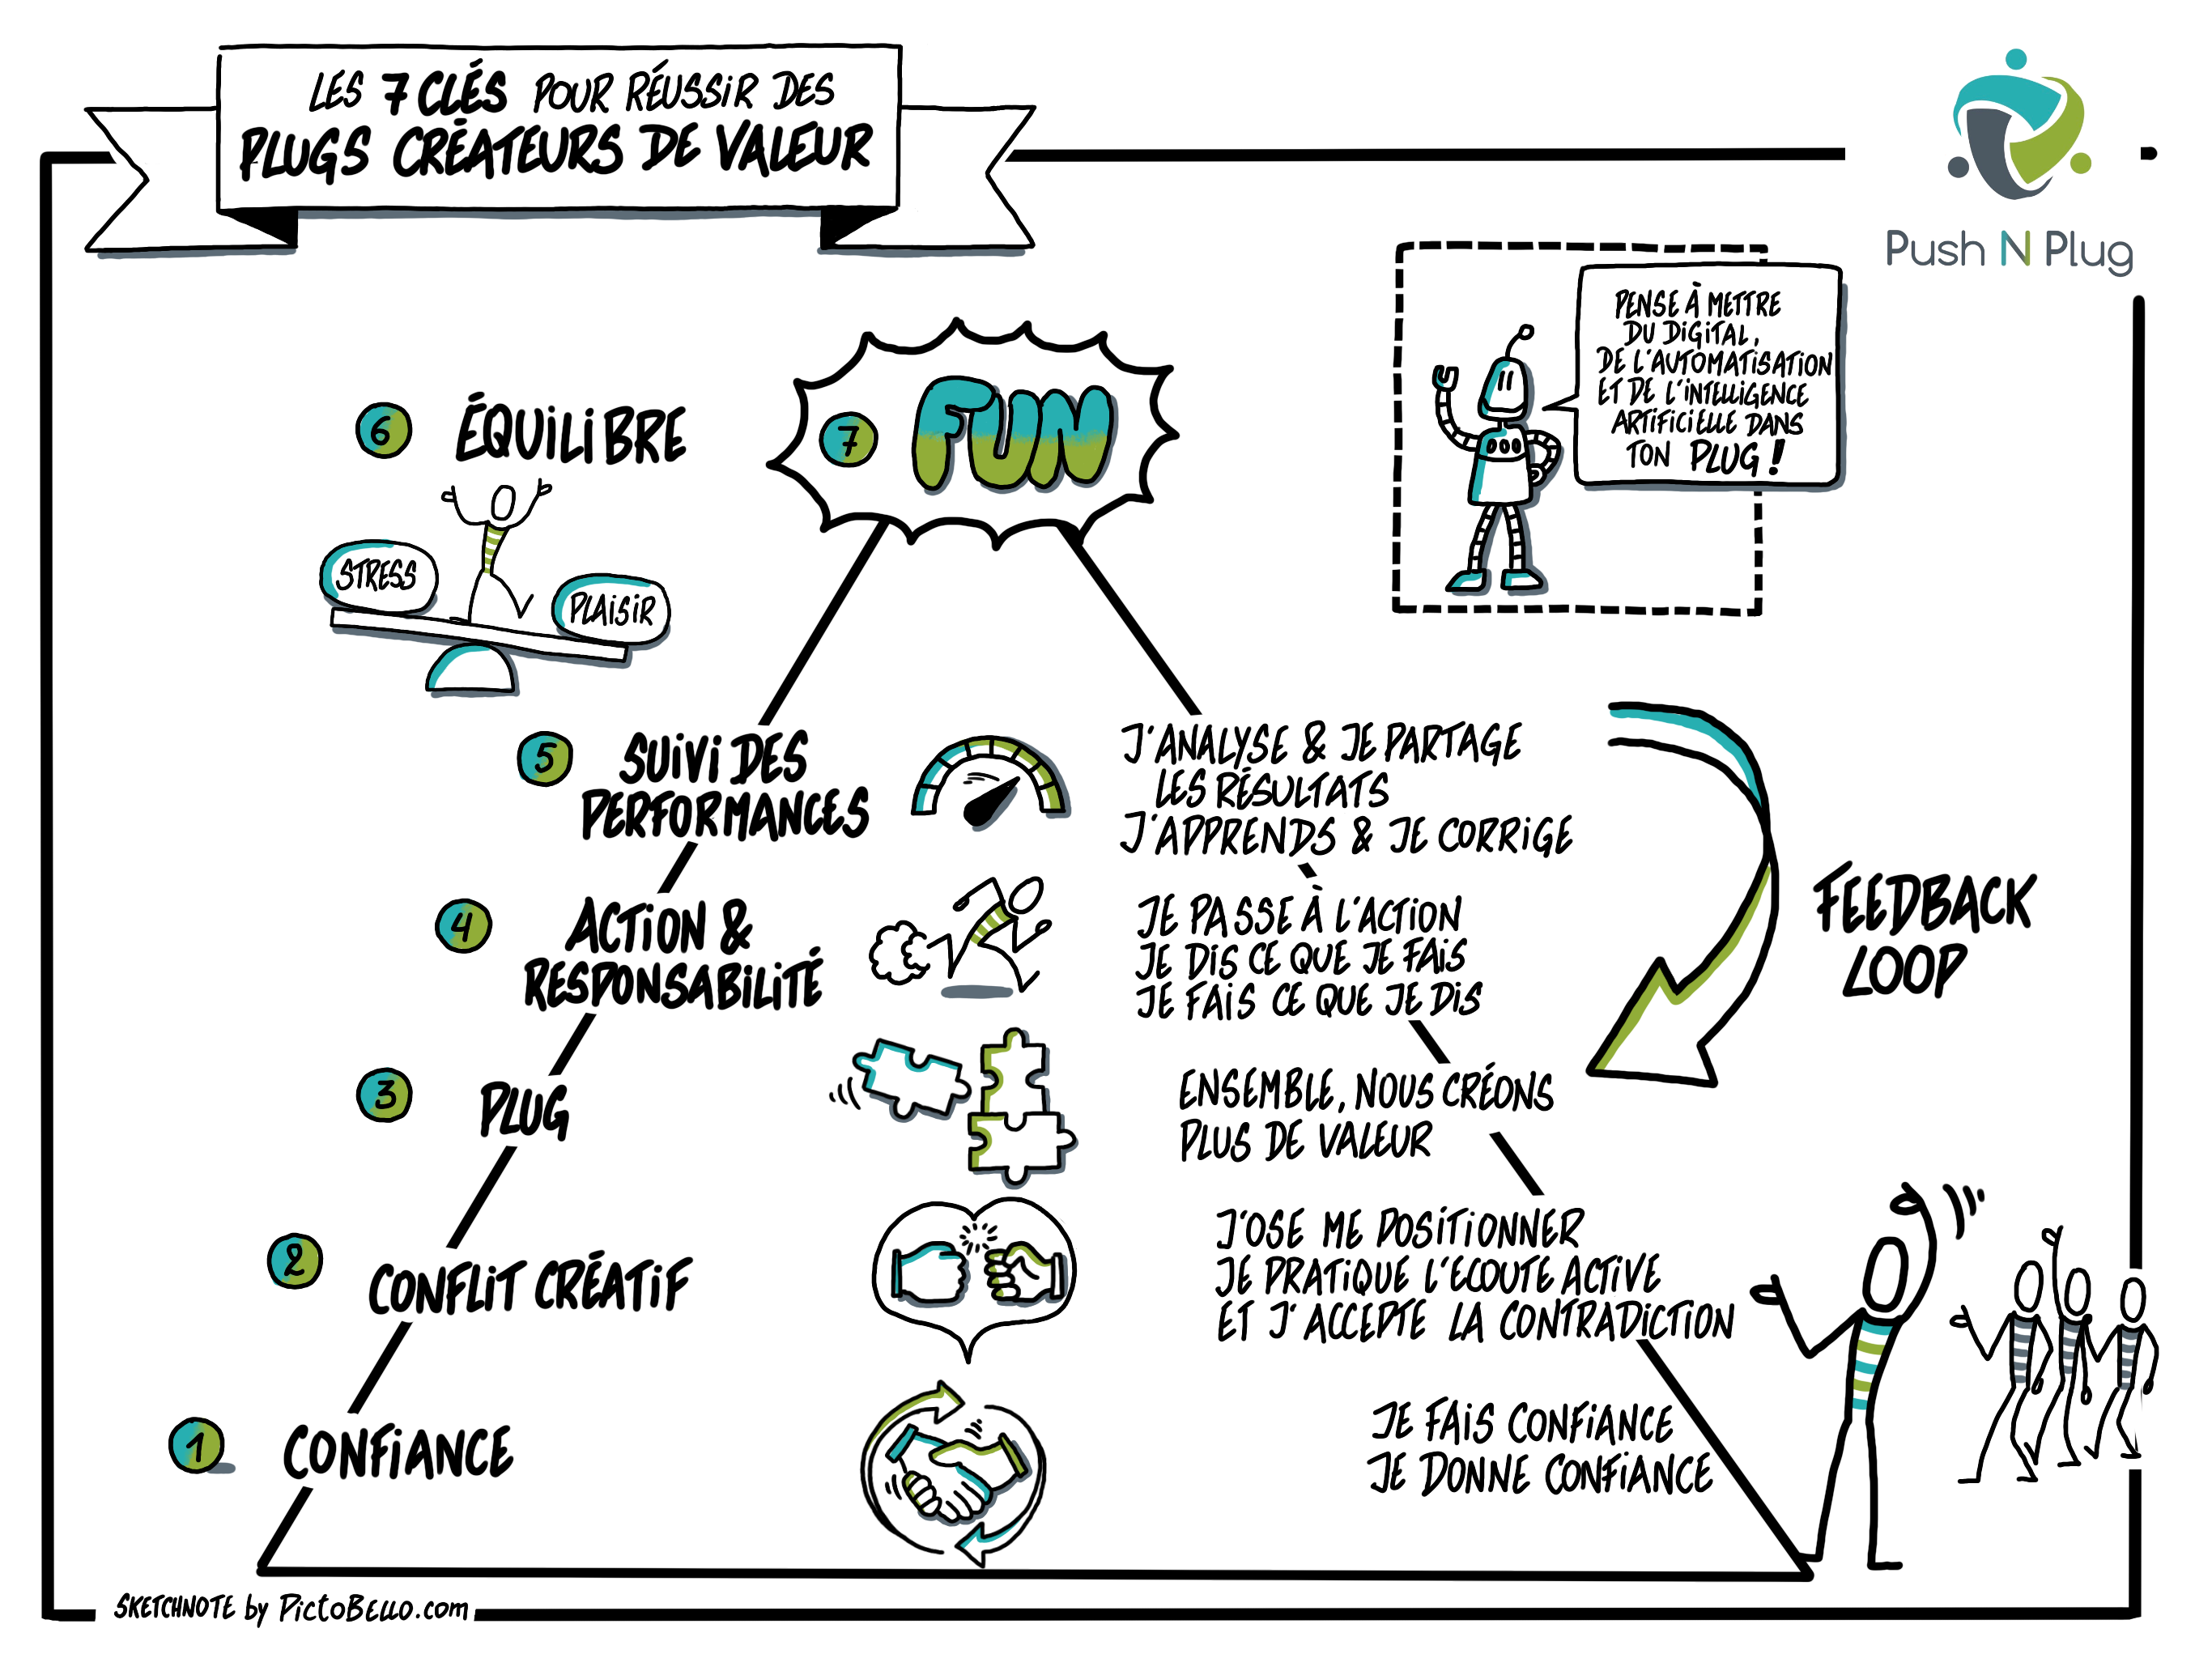 7 clés pour réussir son Entreprenariat Collaboratif - Pictobello.com